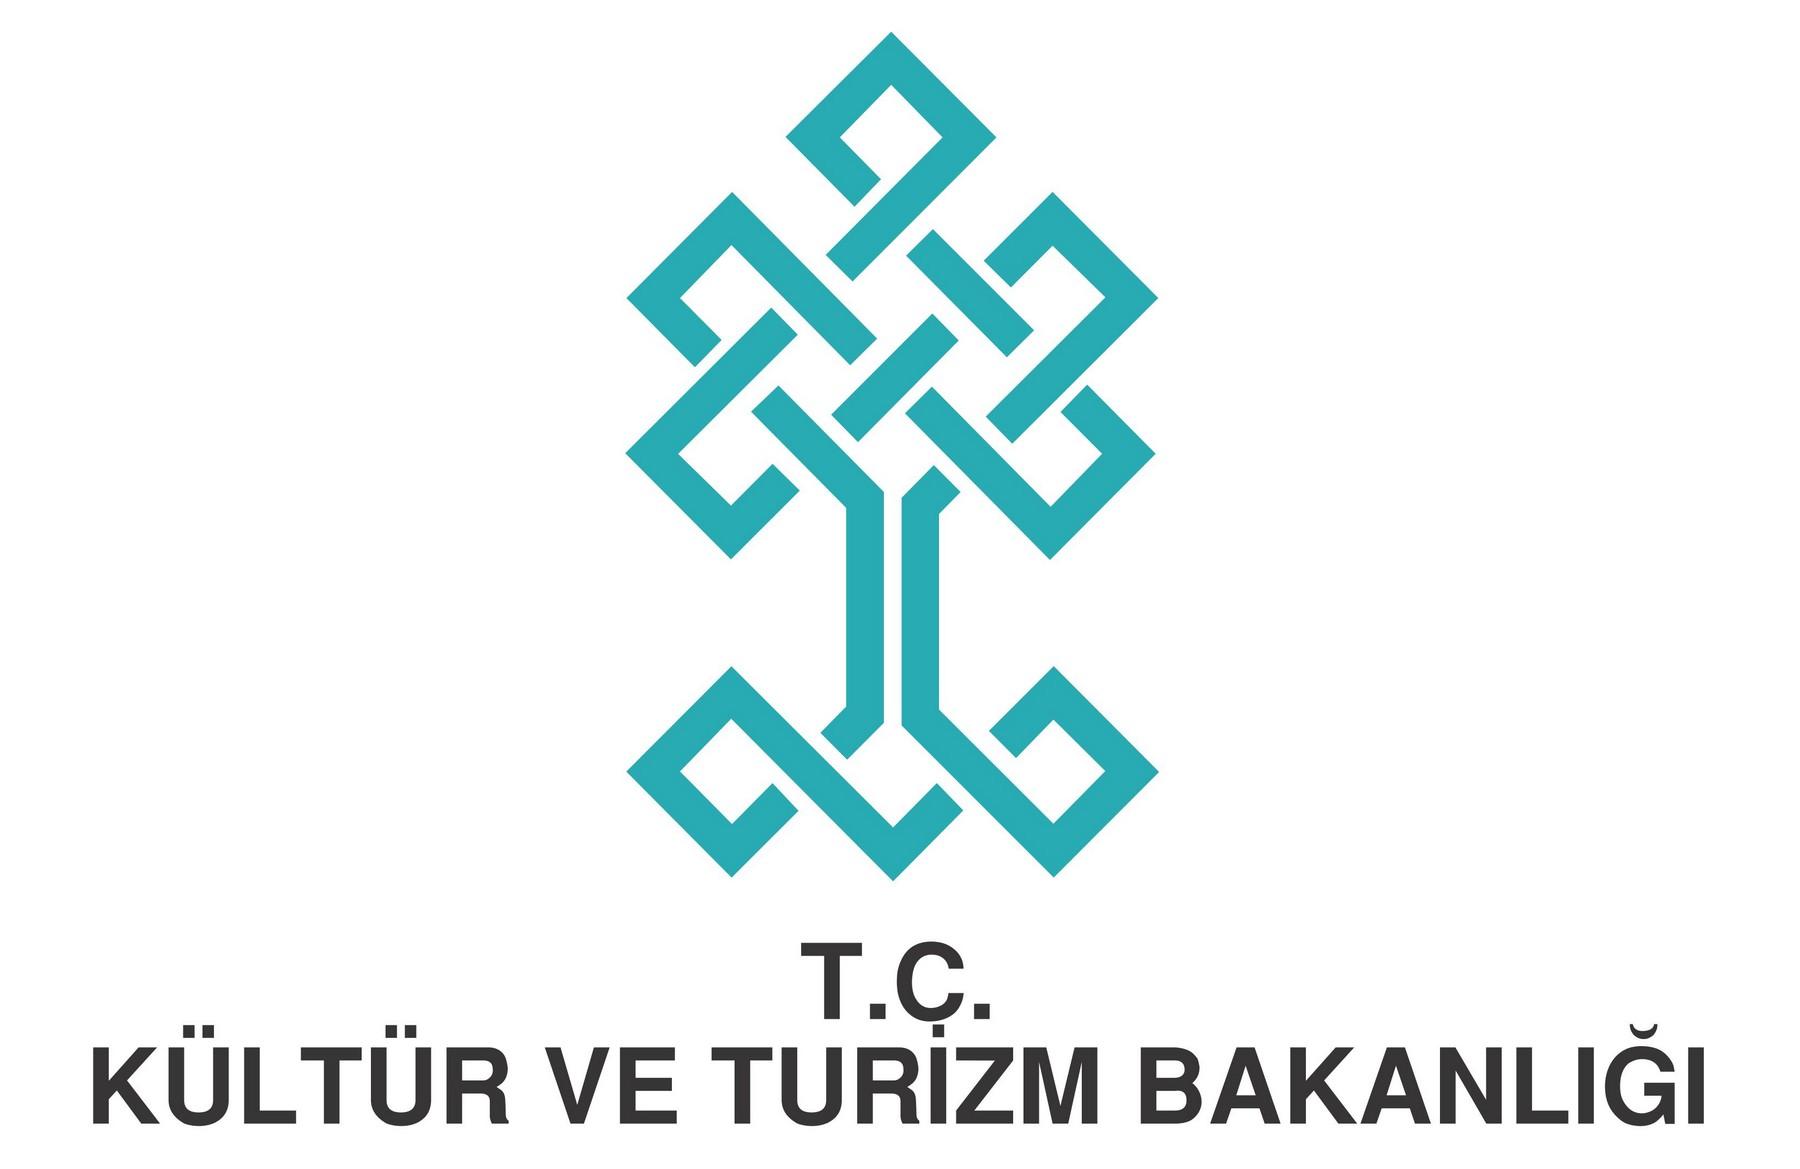 TC Kültür ve Turizm Bakanligi